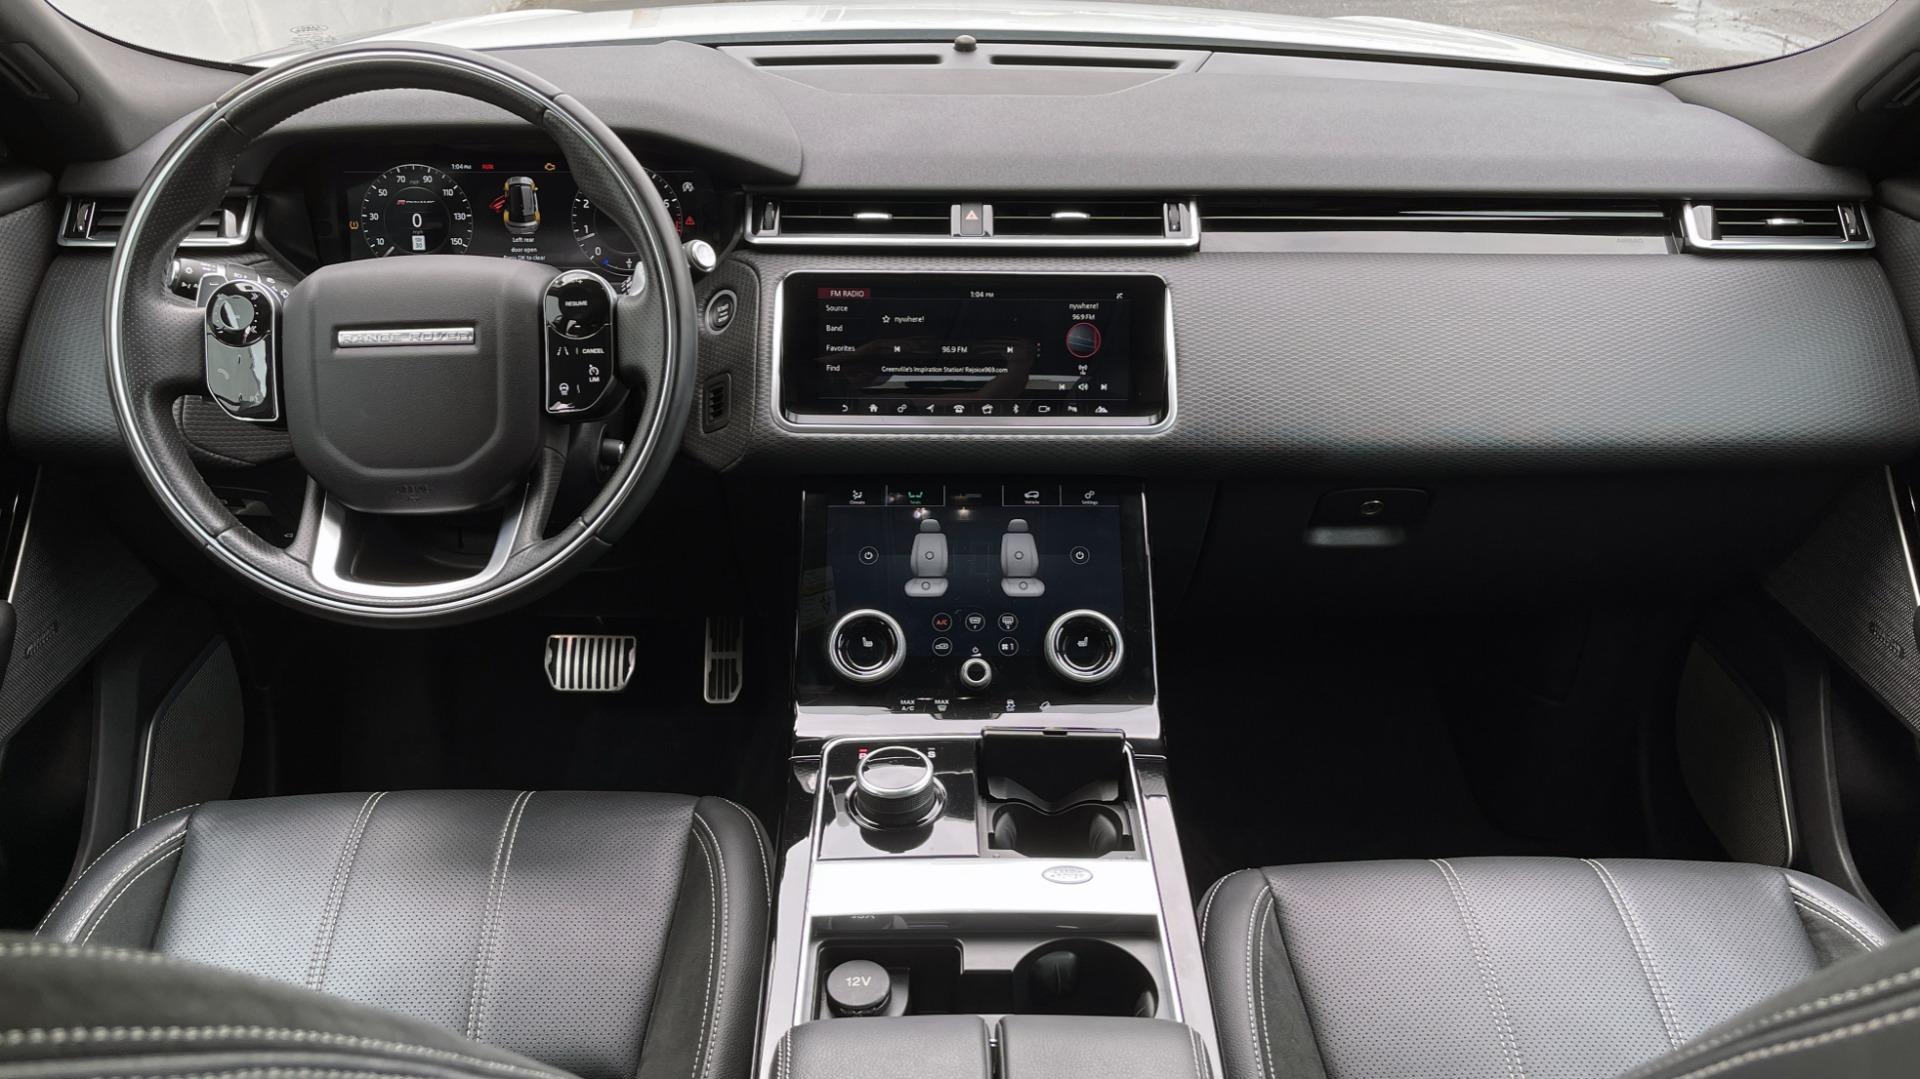 Used 2018 Land Rover RANGE ROVER VELAR R-DYNAMIC SE / NAV / PREM / MERIDIAN / SUNROOF / REARVIEW for sale $54,995 at Formula Imports in Charlotte NC 28227 55